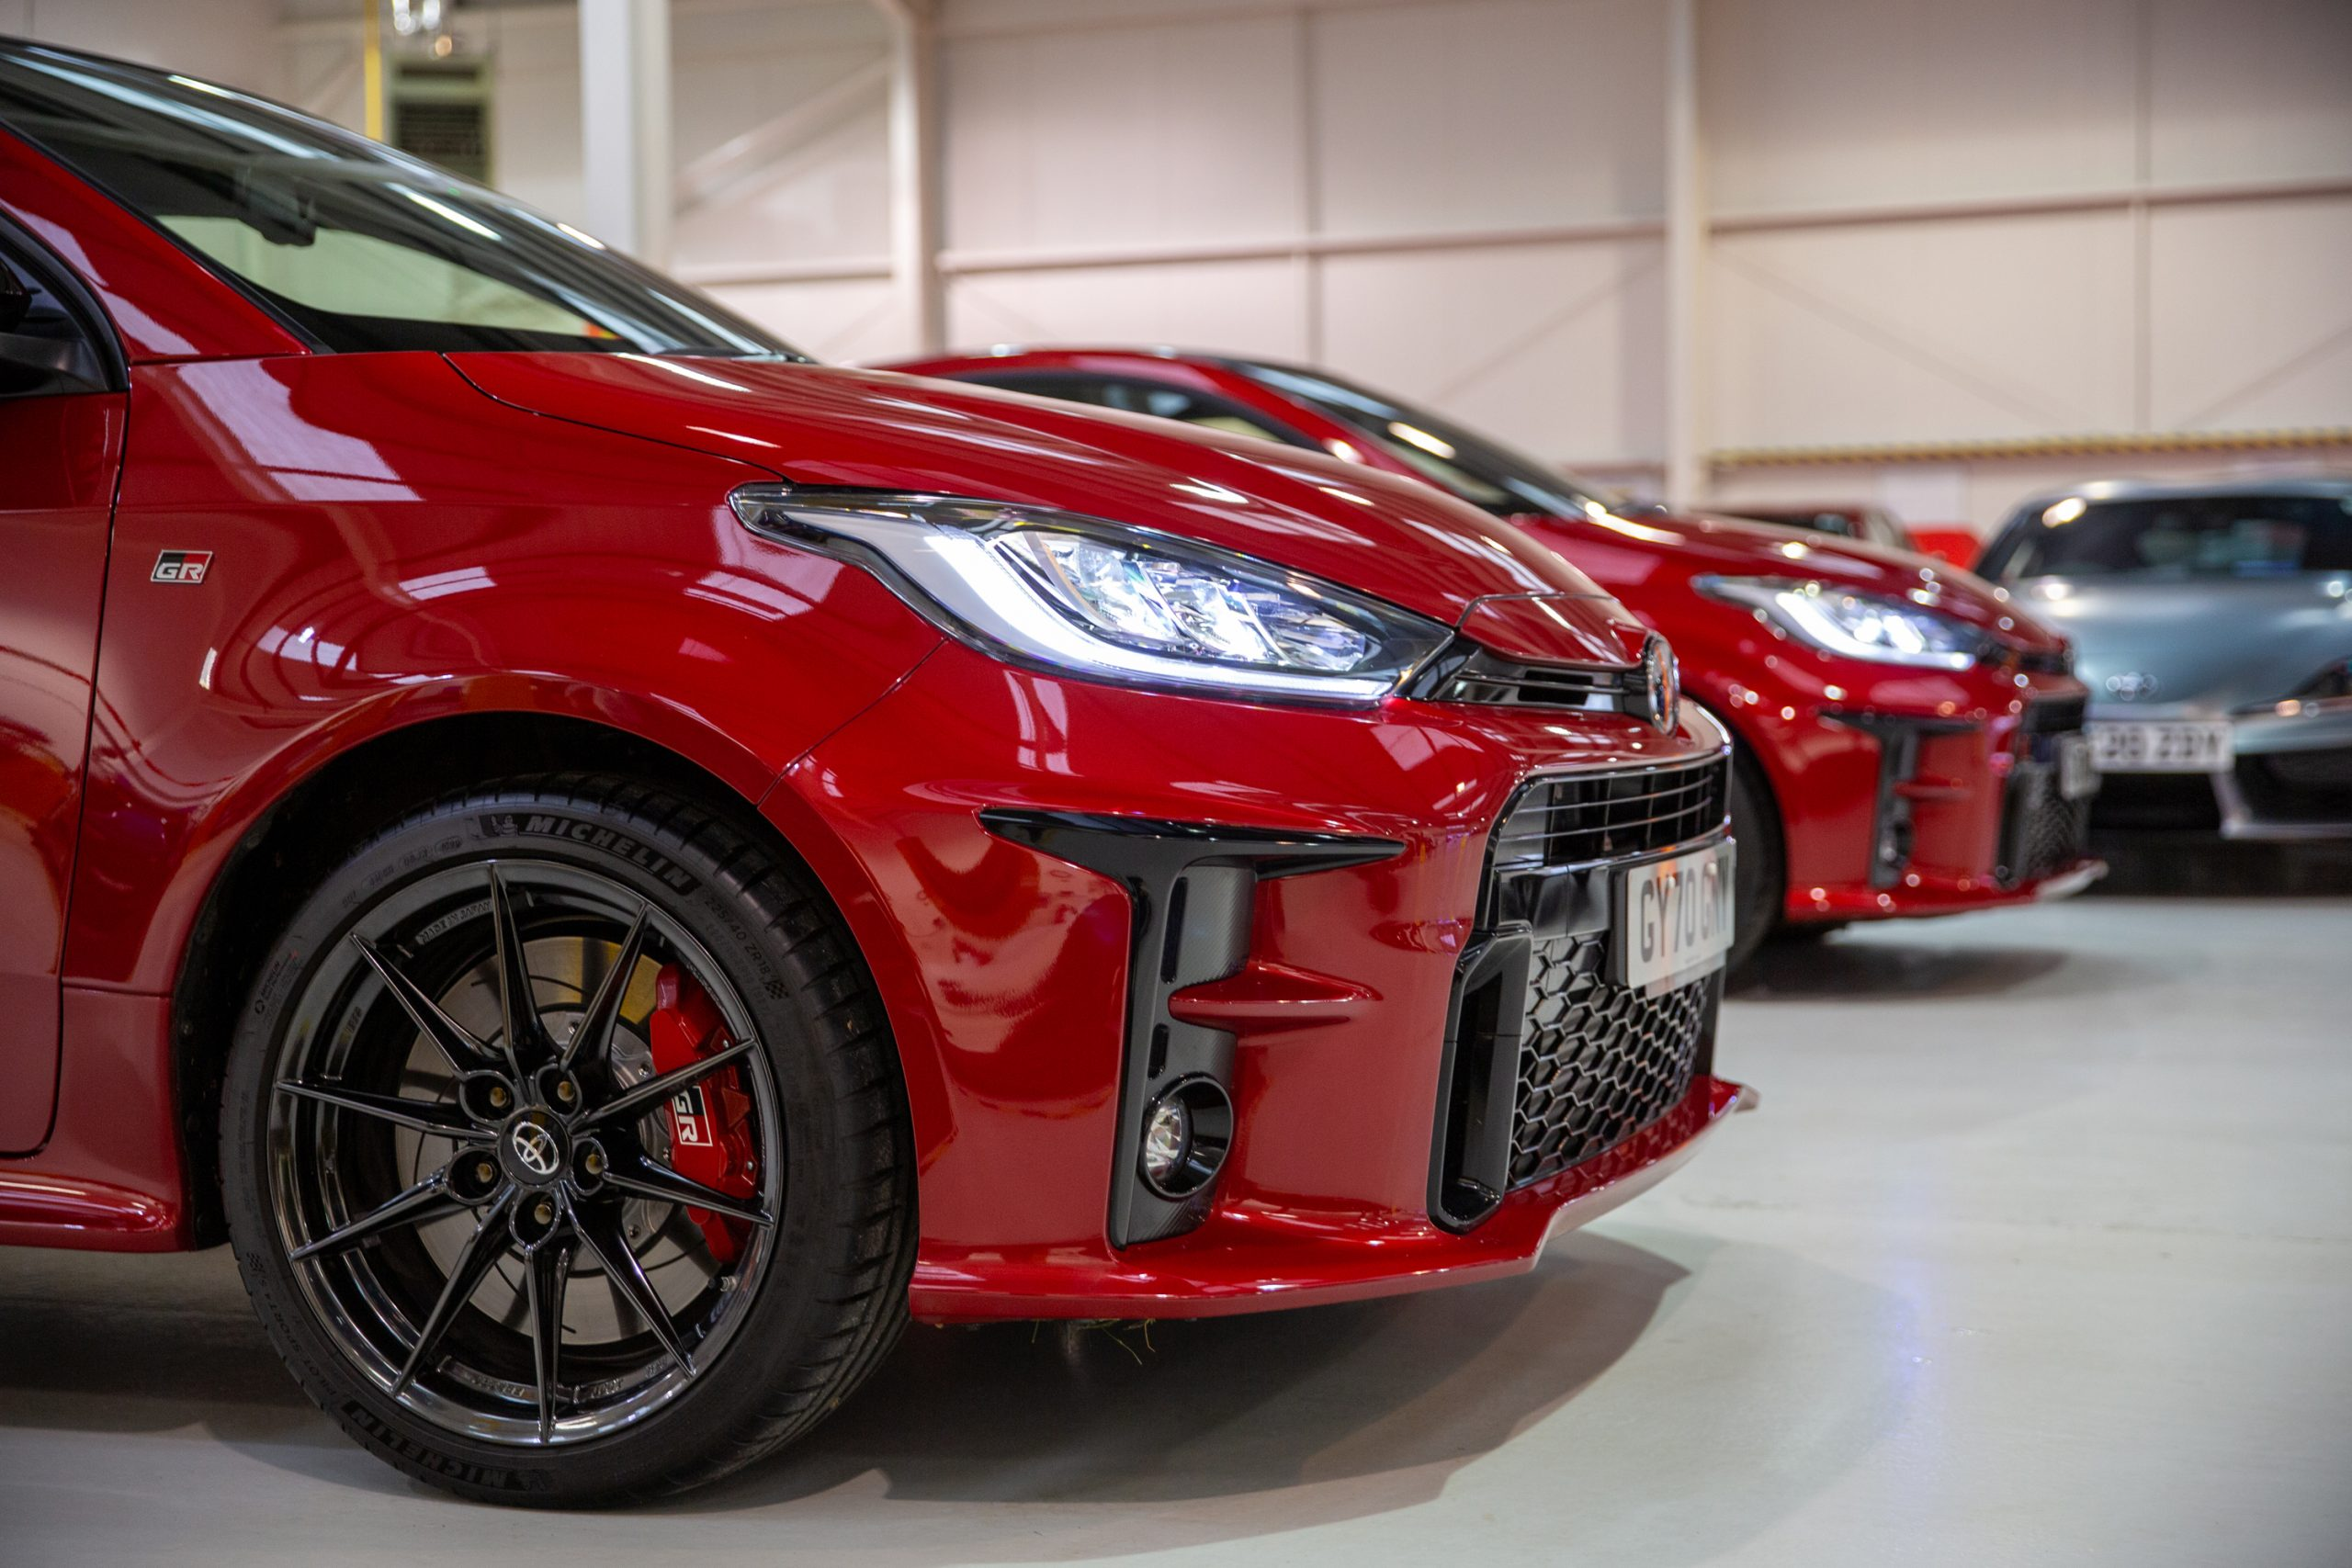 GR Toyota Yaris front fascia